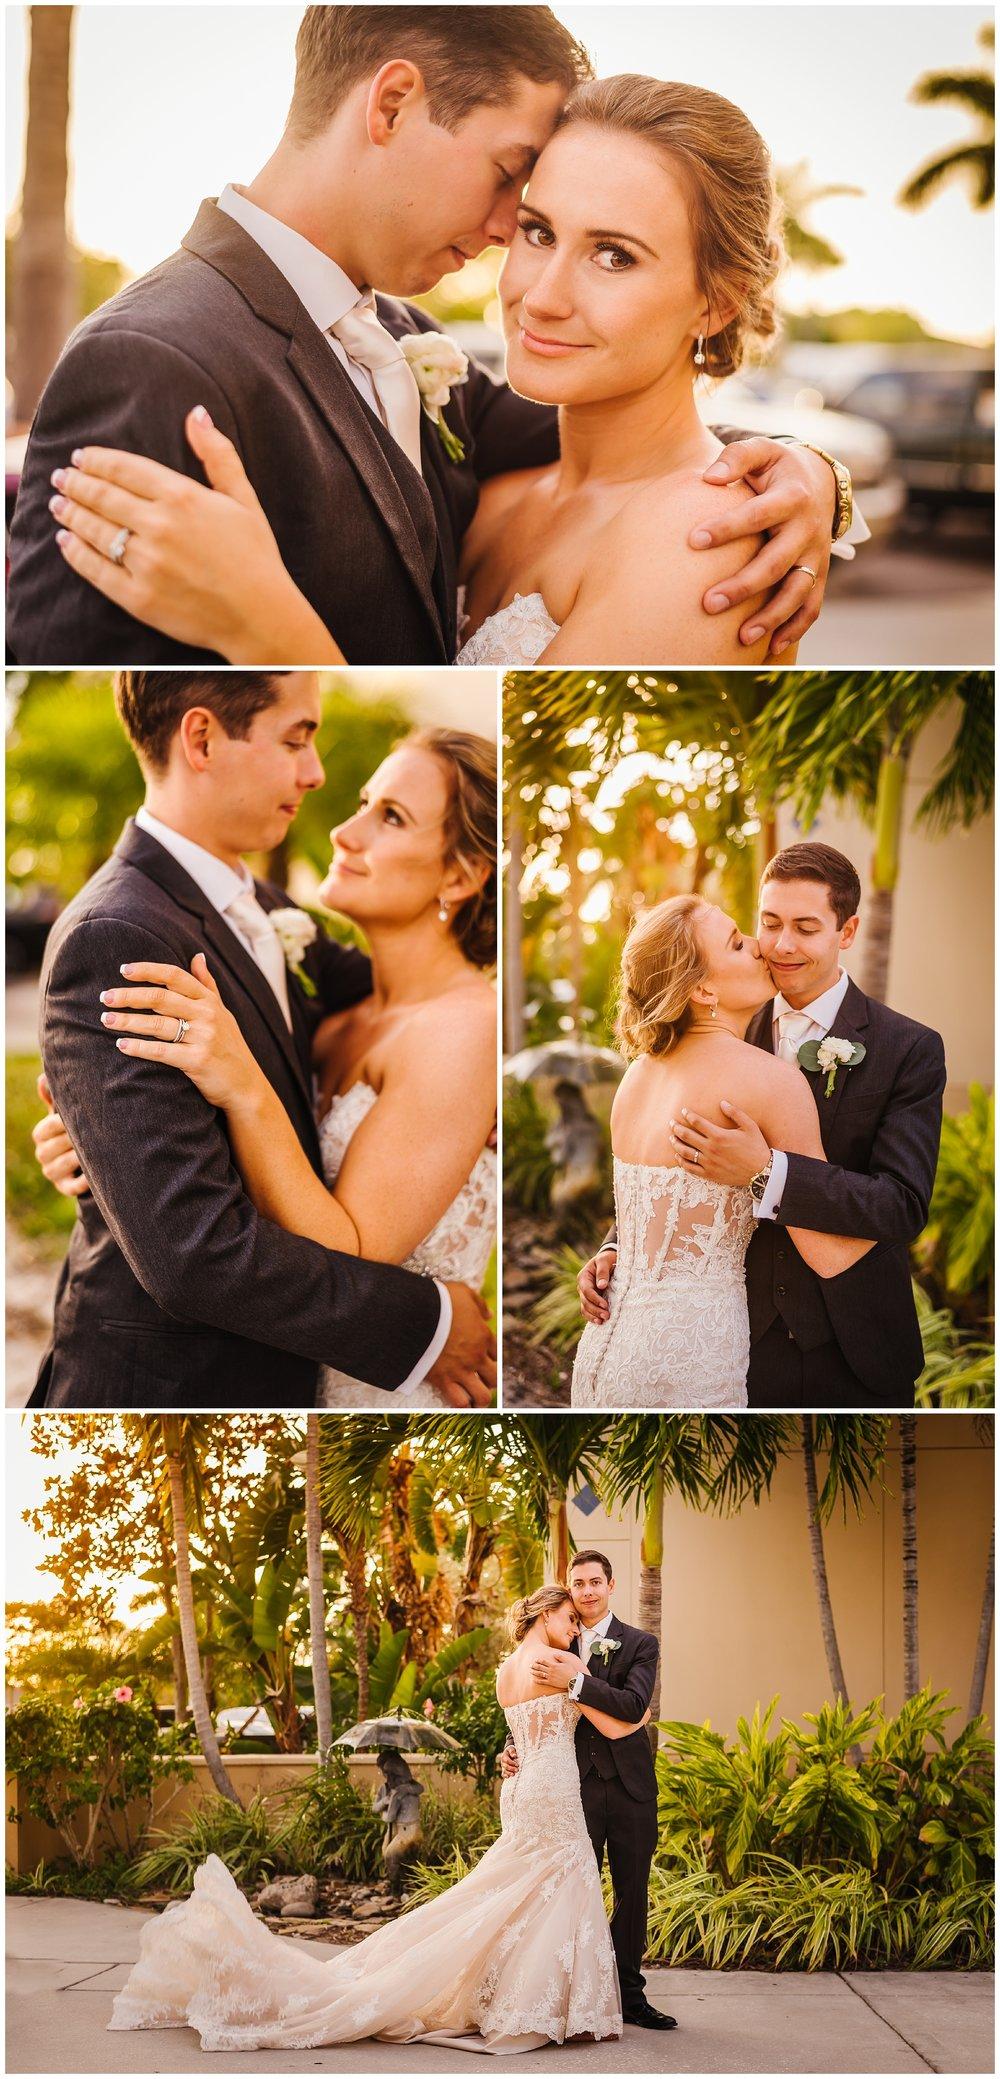 Tampa-wedding-photographer-bella-fleur-orchid-boquet-rsvb-events_0024.jpg